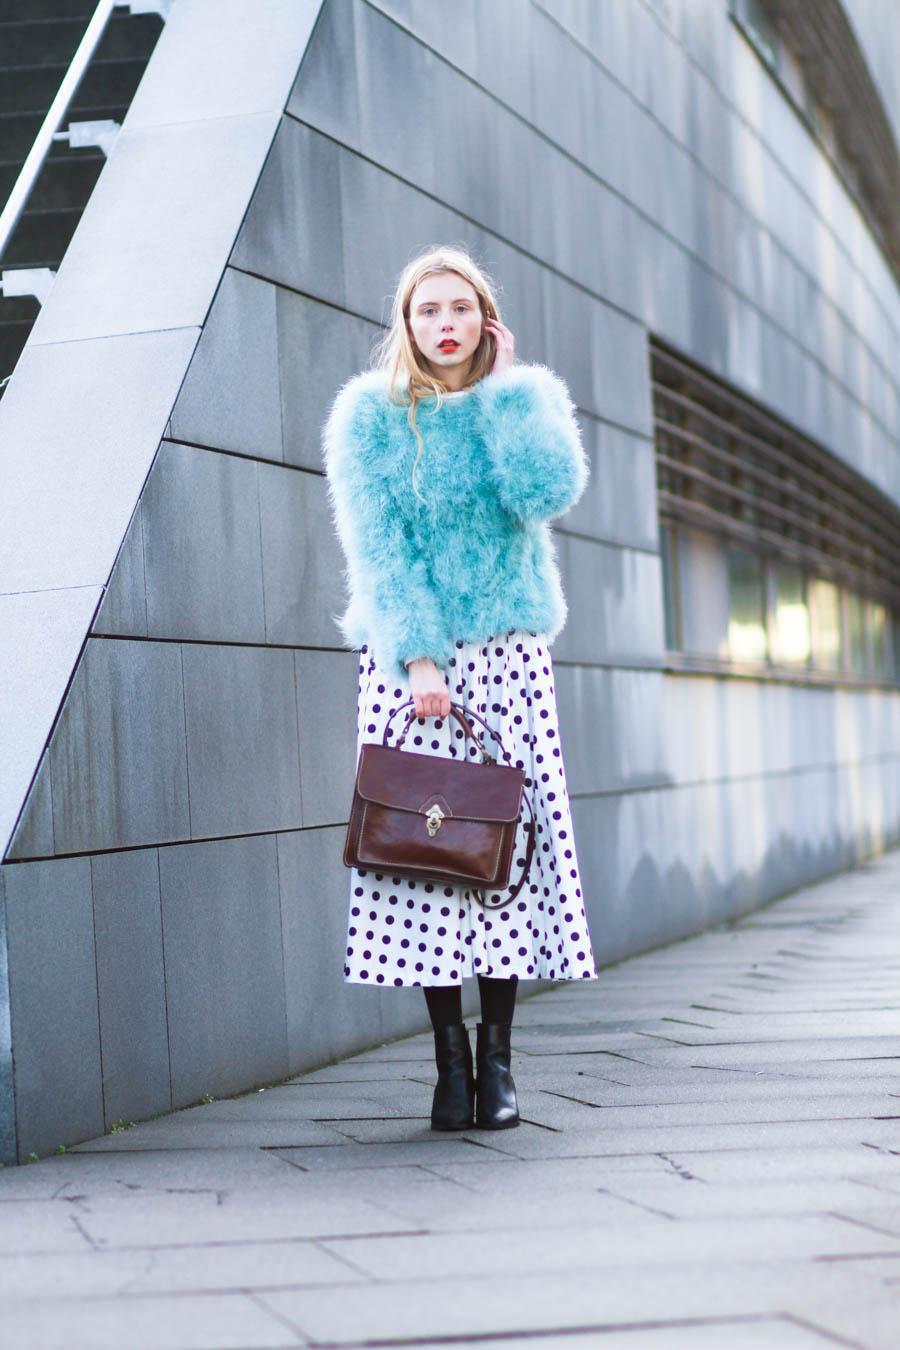 outfit December nemesis babe marie jensen danish blogger -1-6